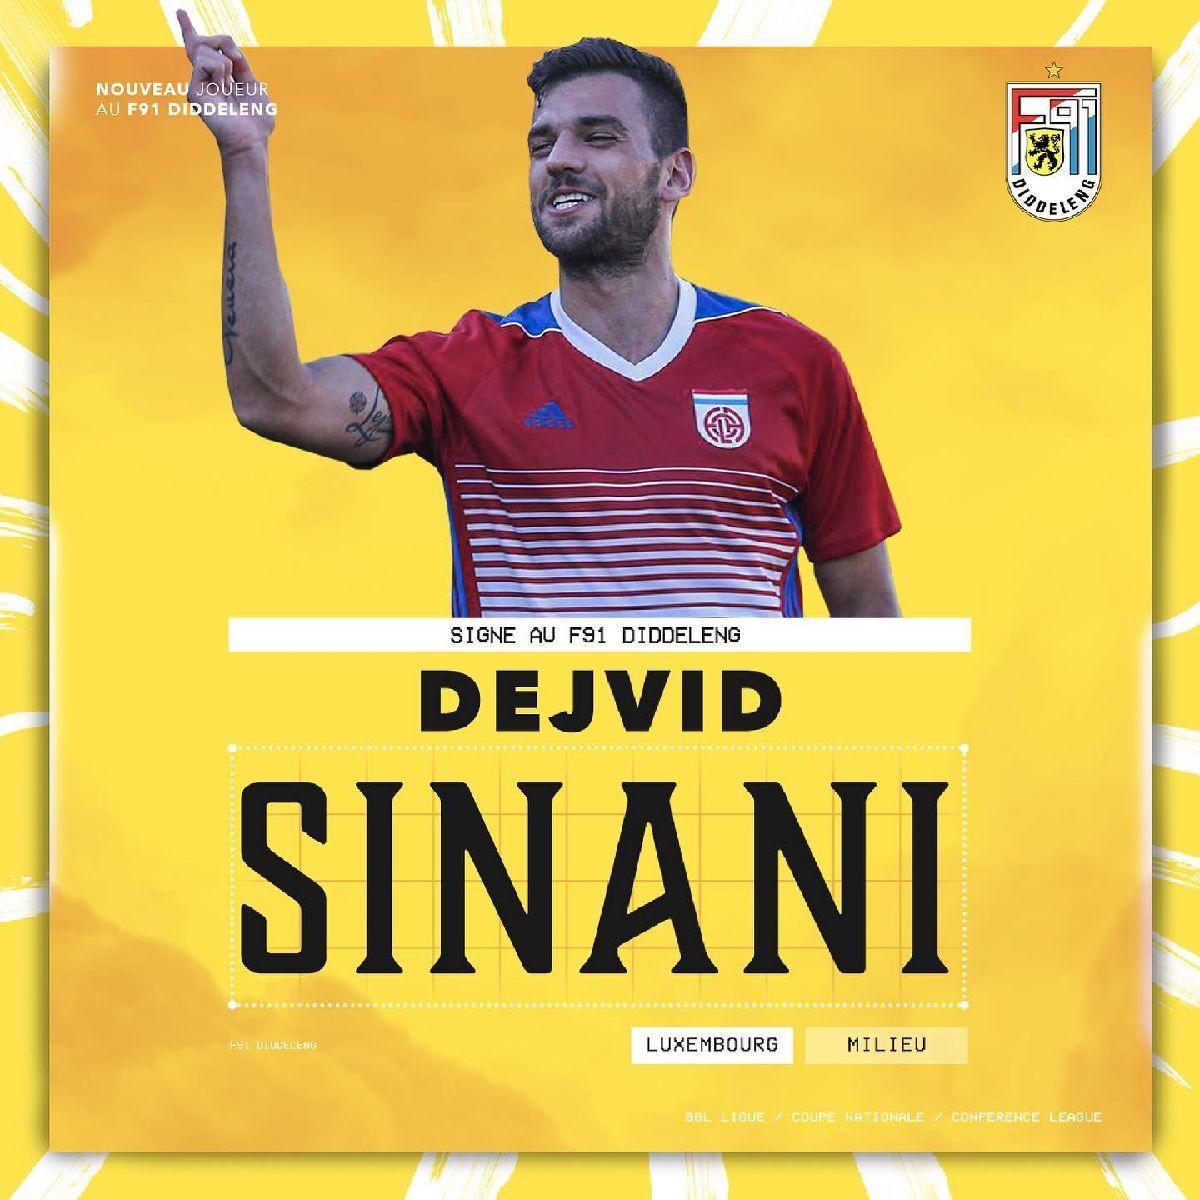 Dejvid Sinani rejoint le F91